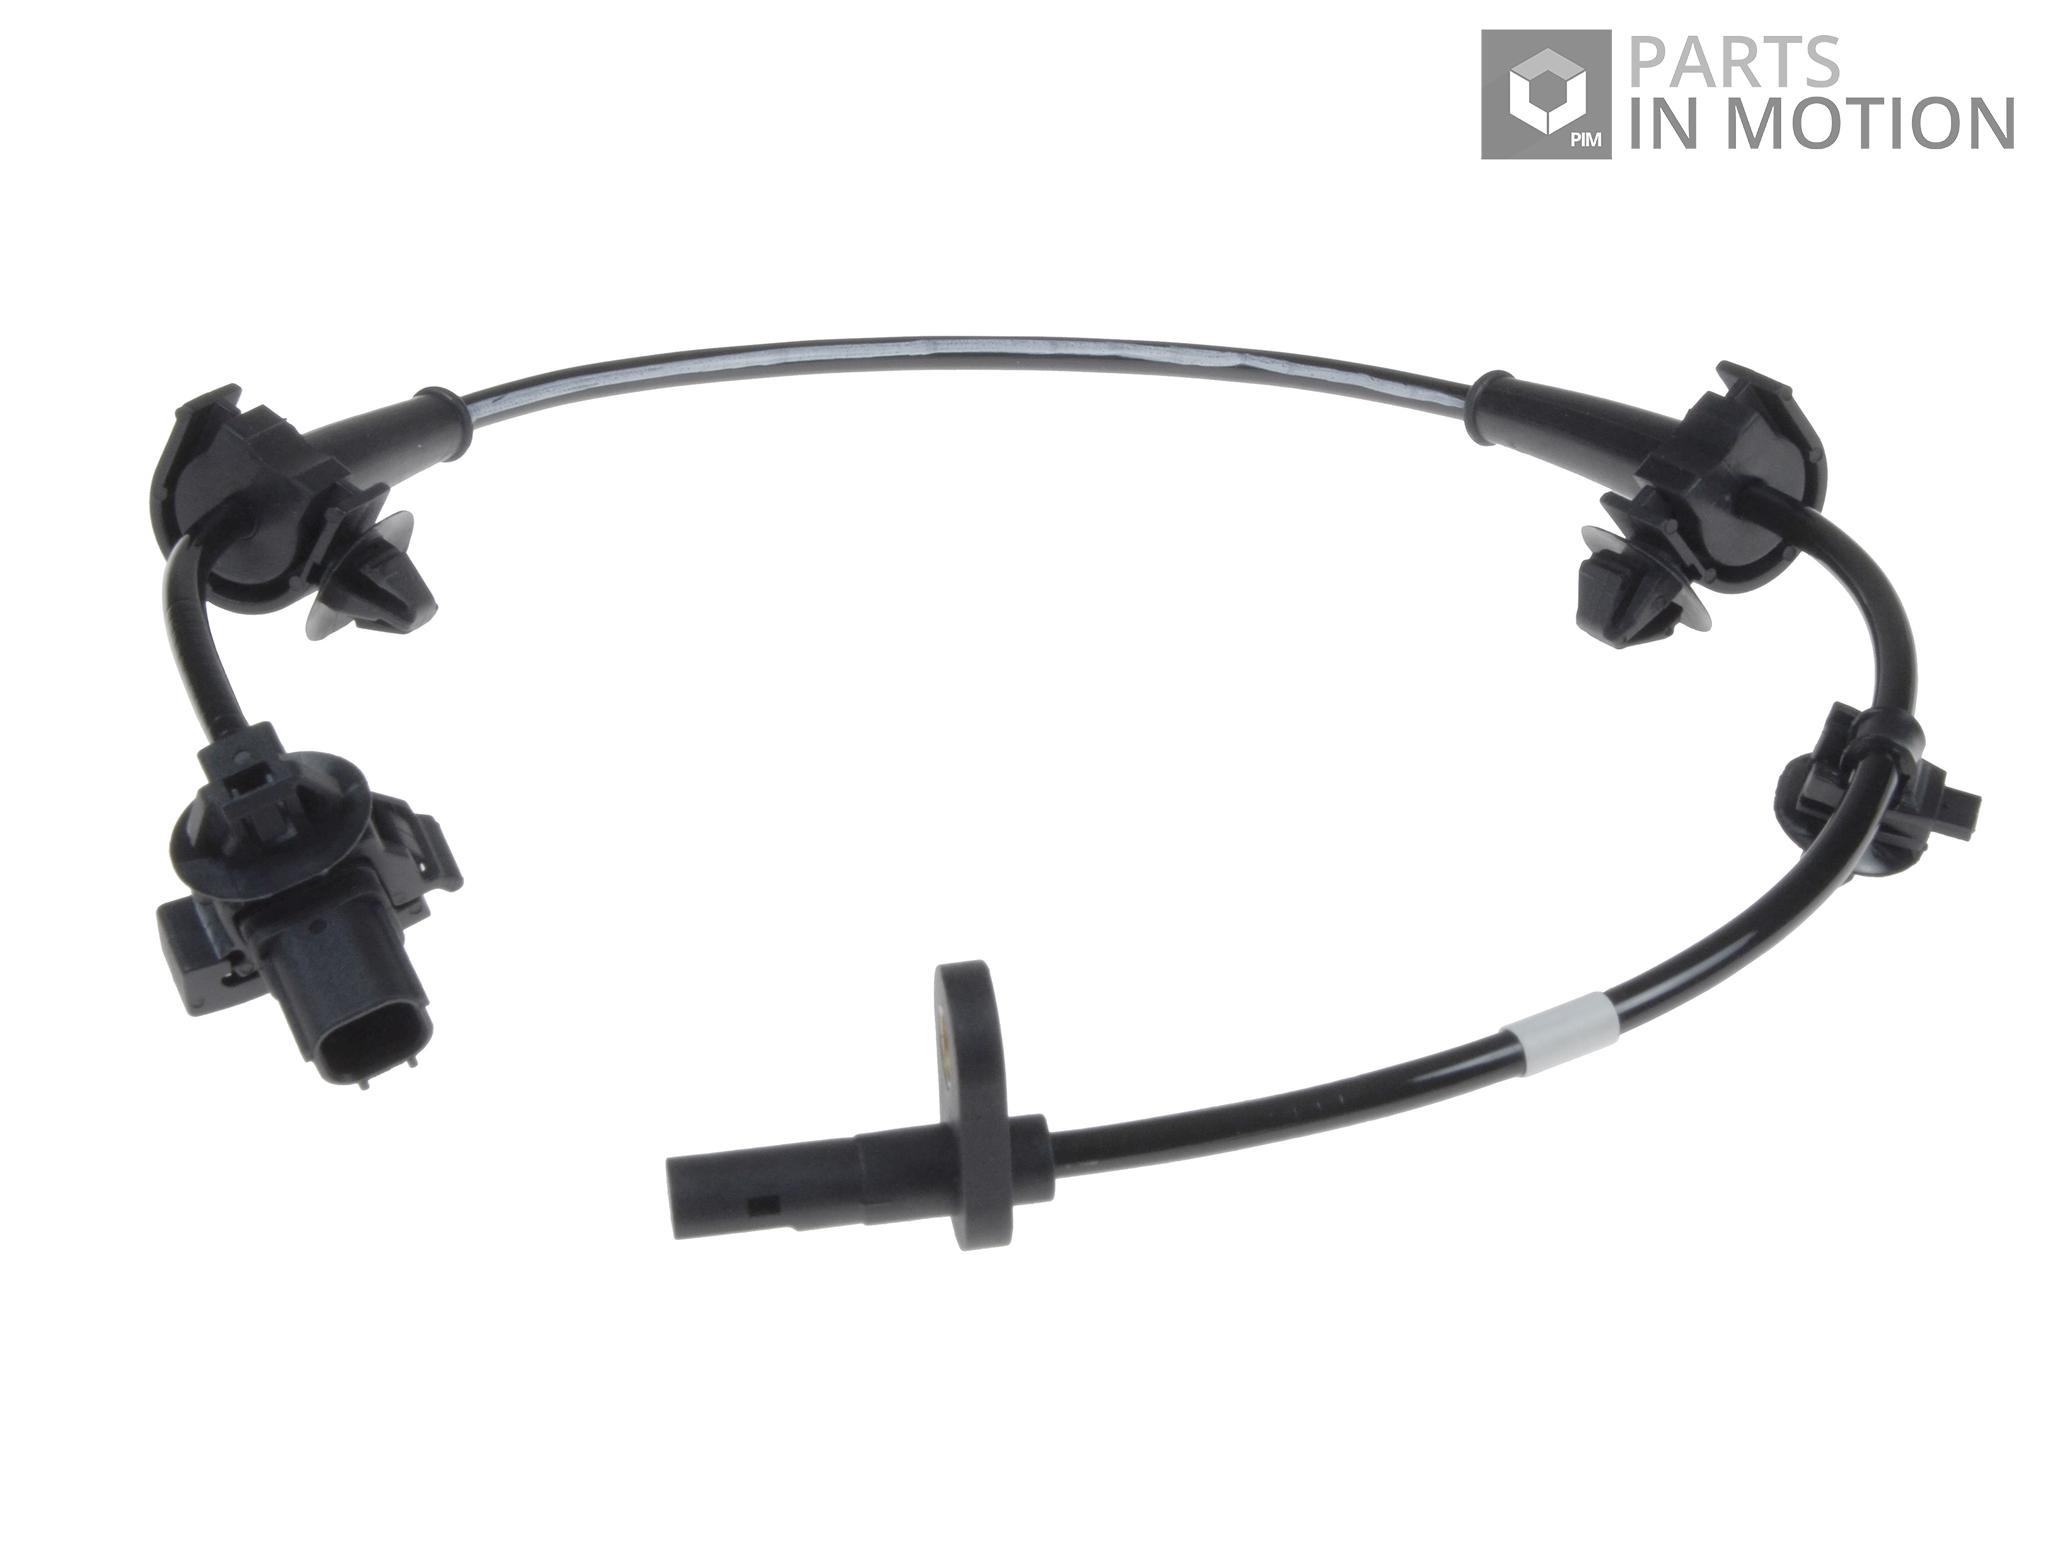 Rear Right ABS Sensor Honda CIVIC MK8 57470-SMG-E01 57470-SMG-E02 //57470SMGE01